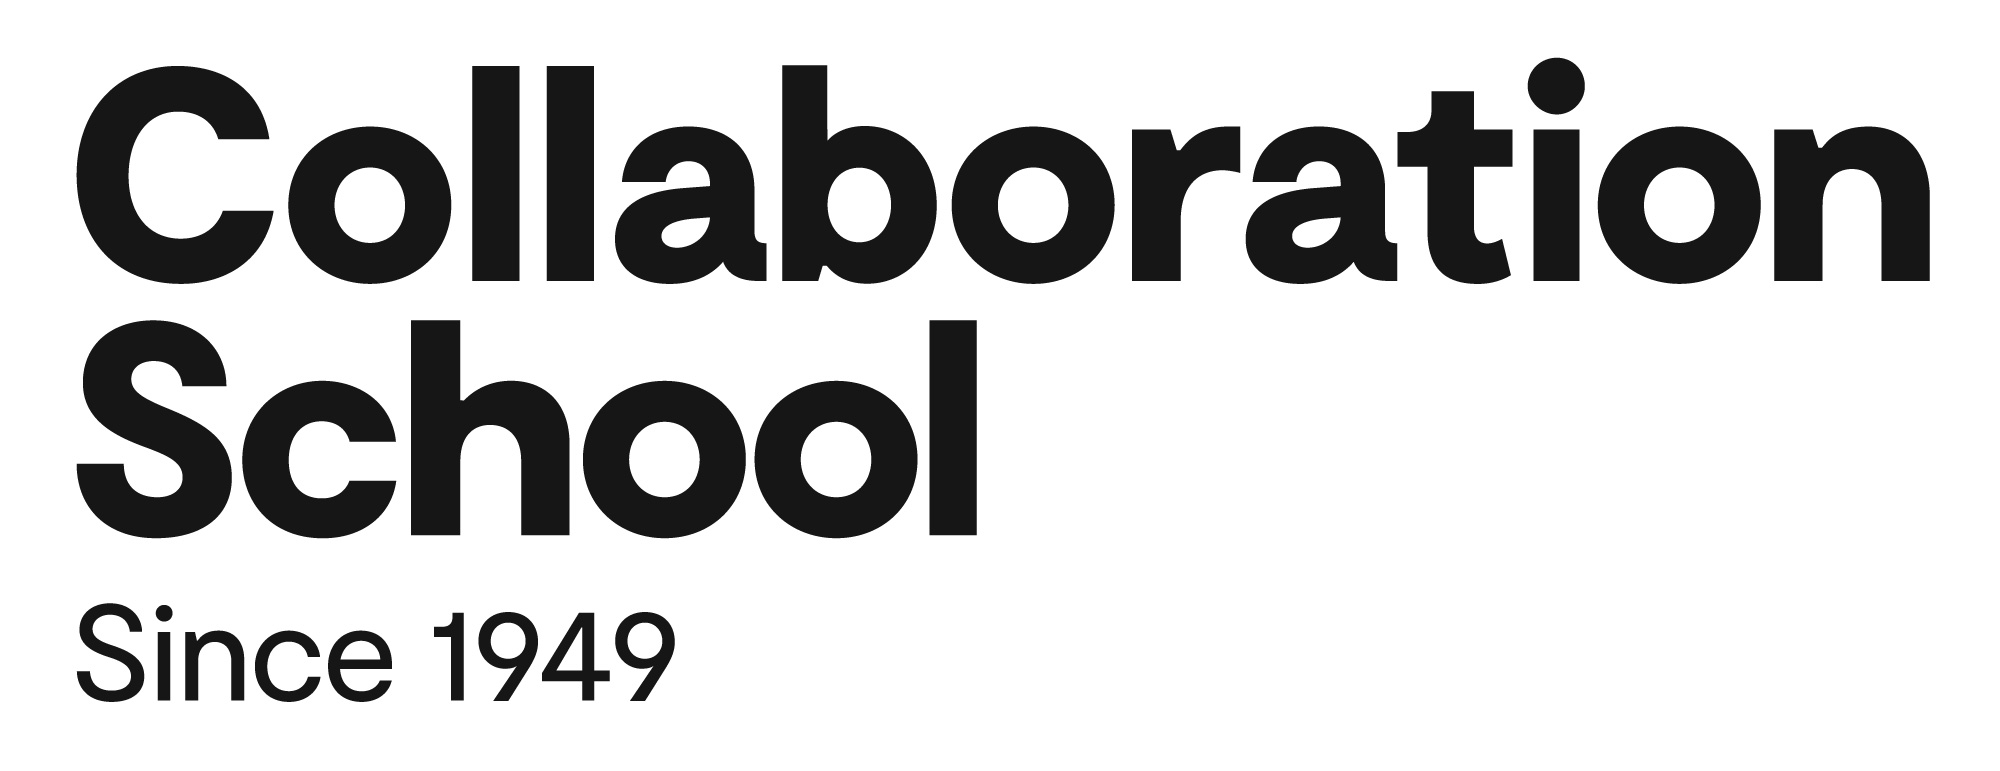 distinc_portfolio_westland_school_logo2.jpg